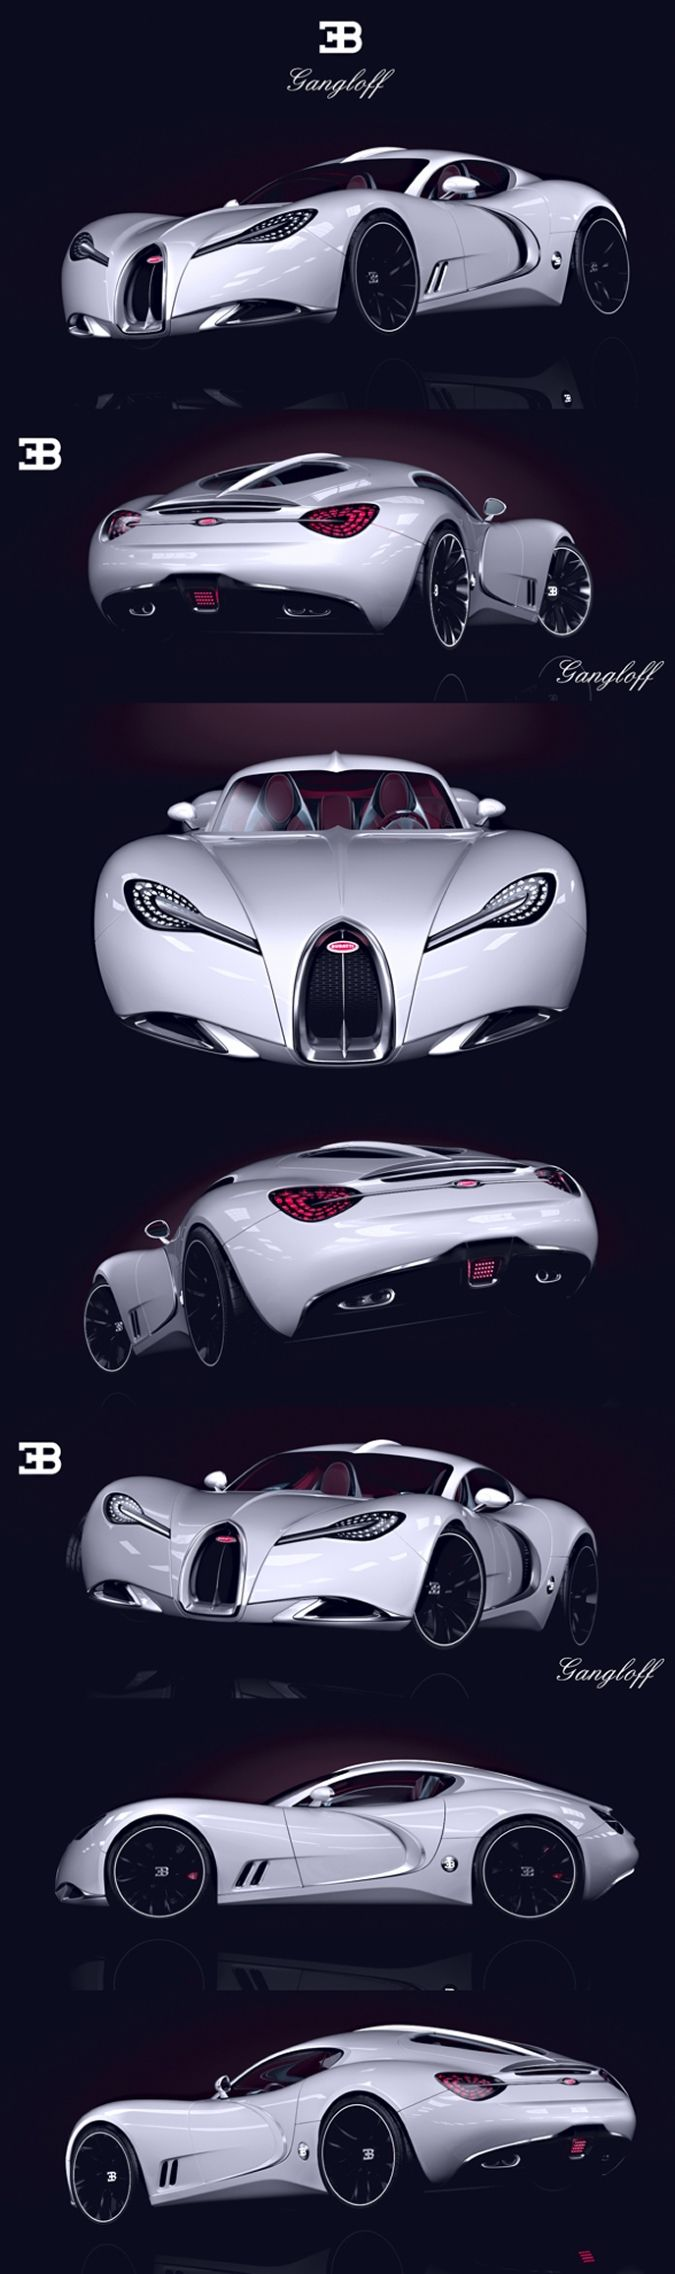 Pawel Czyzewski Supercar Concept Bugatti Gangloff - Front, Side, Back View Pictures